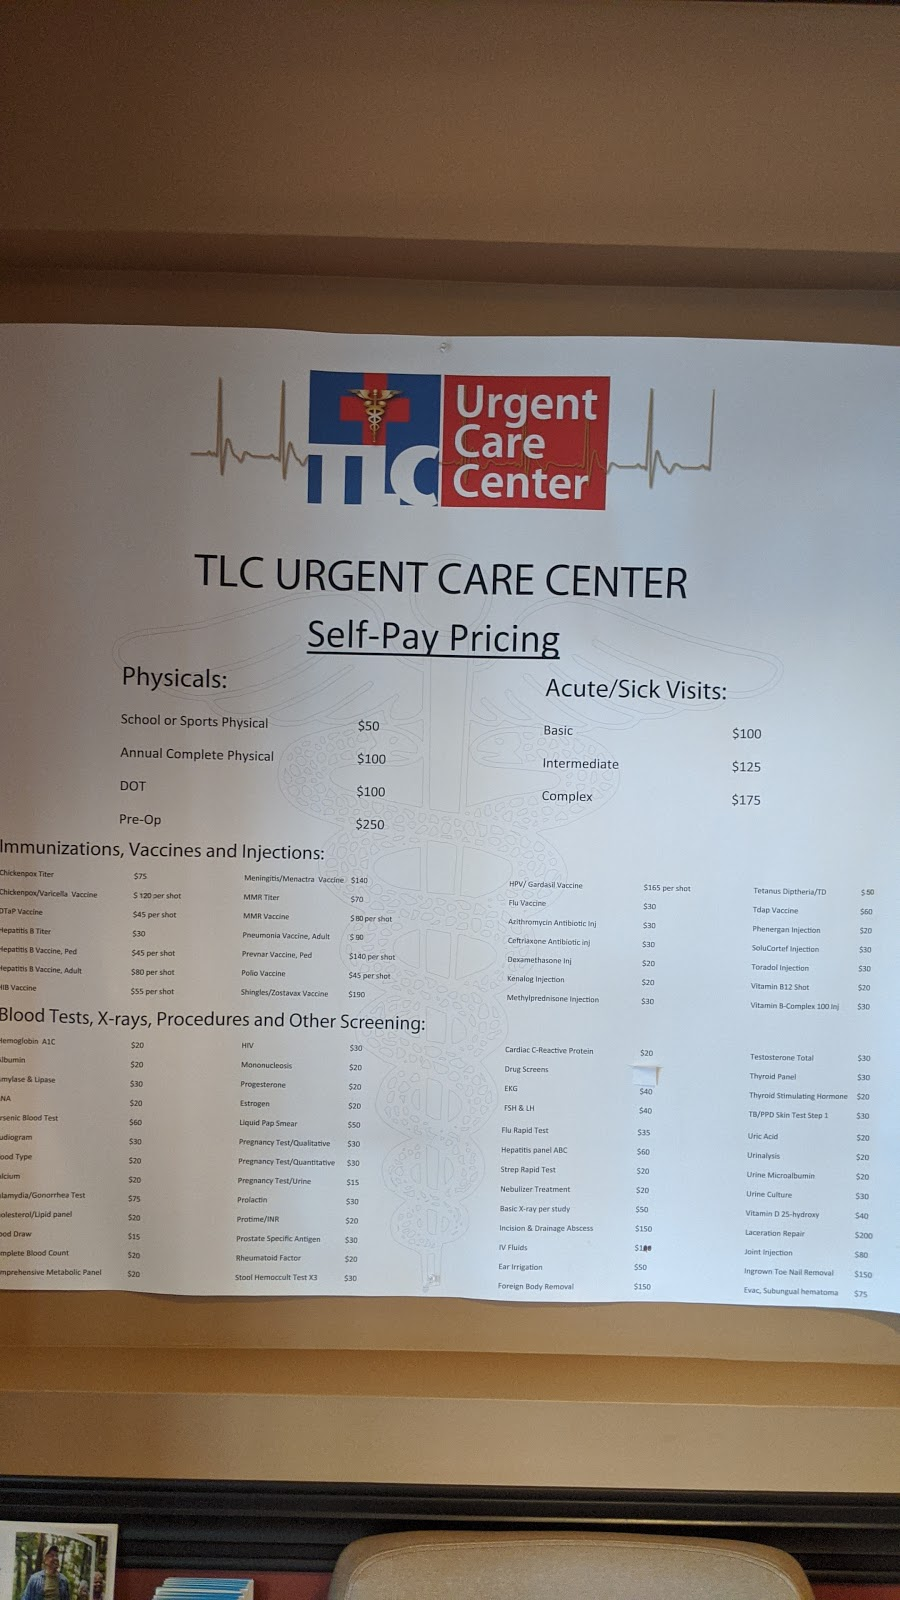 TLC Urgent Care Center - health  | Photo 4 of 5 | Address: 10205 W Hillsborough Ave, Tampa, FL 33615, USA | Phone: (813) 884-2370